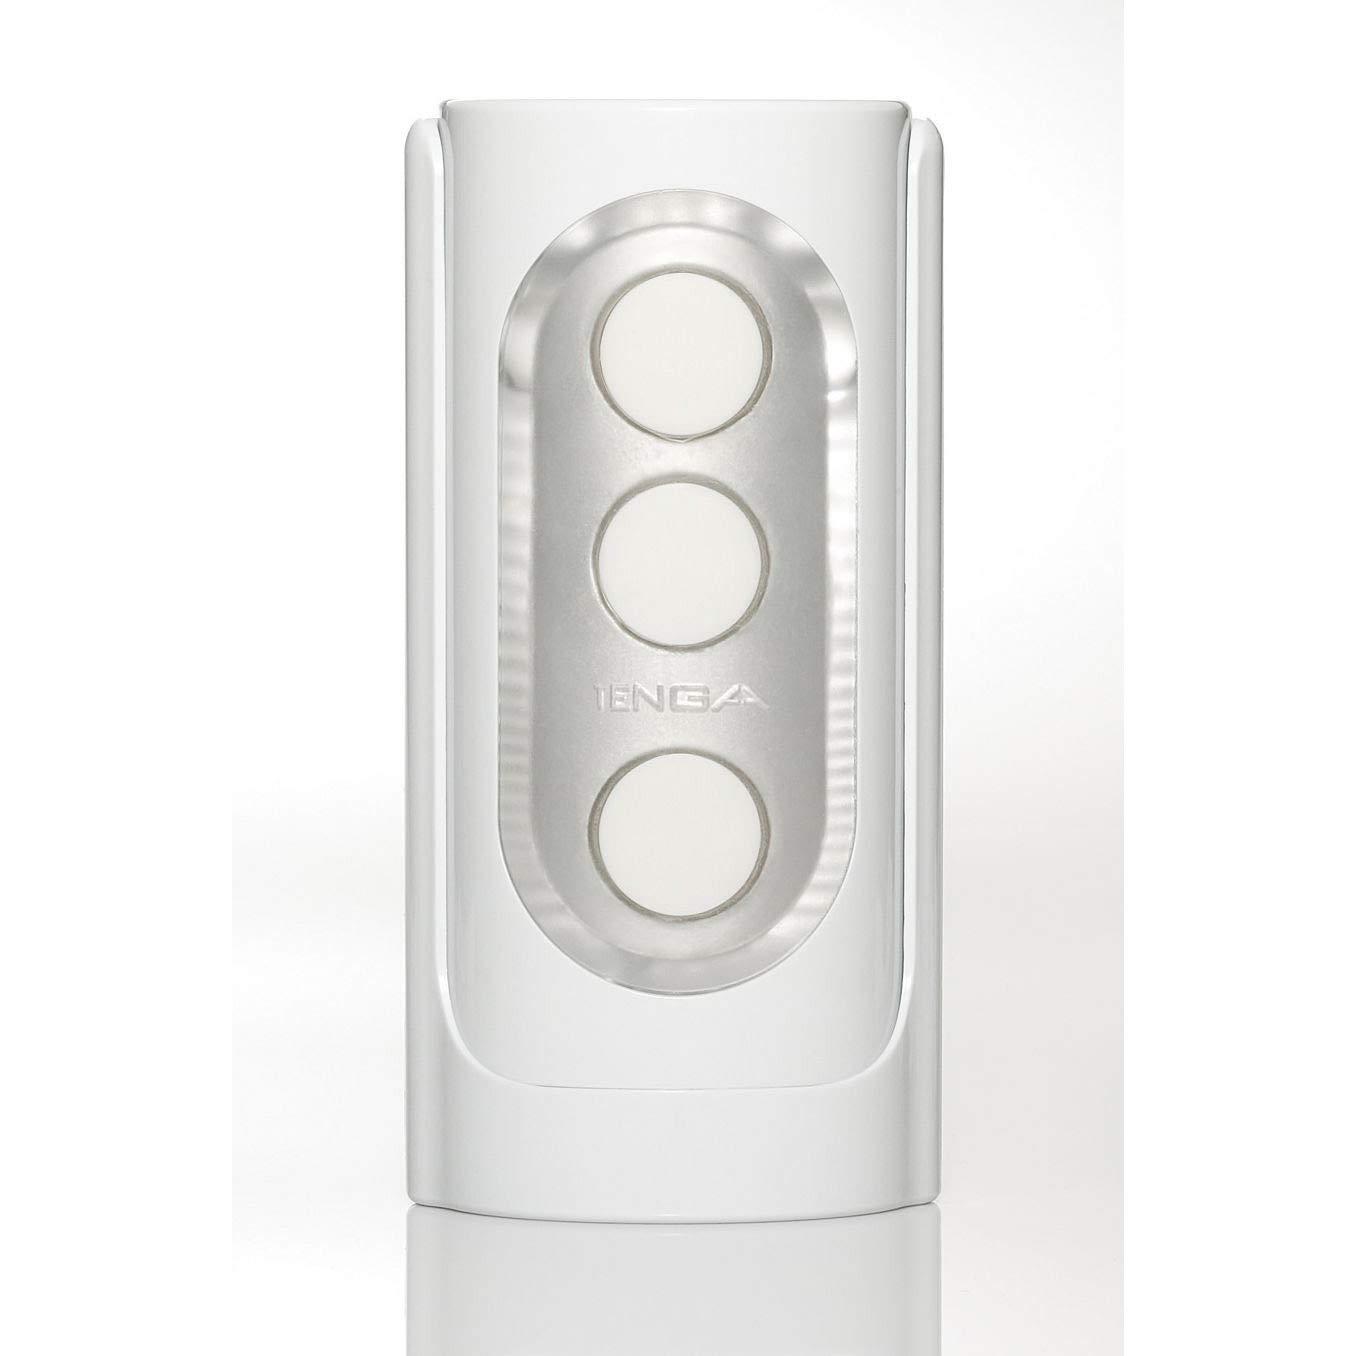 Tenga Flip Hole White with Free Passion Lube 8oz Bottle by TENGA